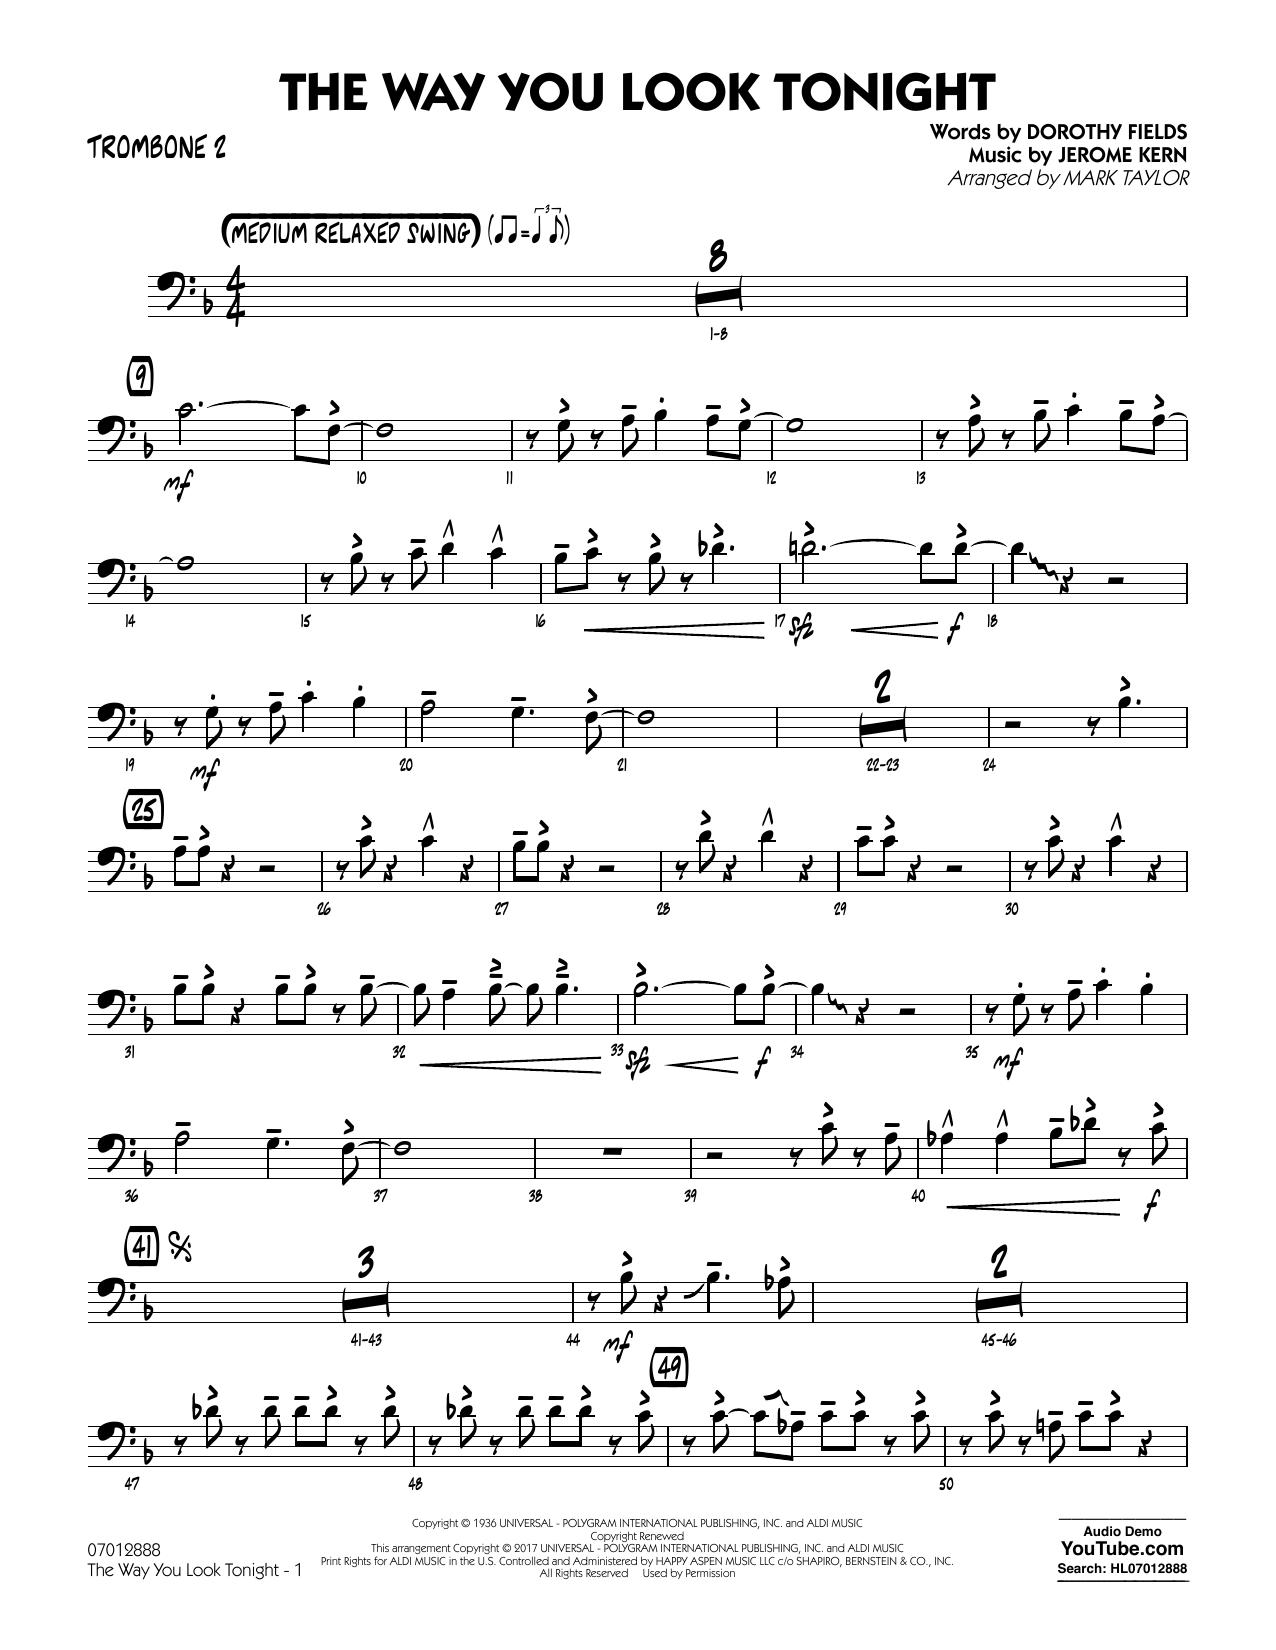 The Way You Look Tonight - Trombone 2 (Jazz Ensemble)